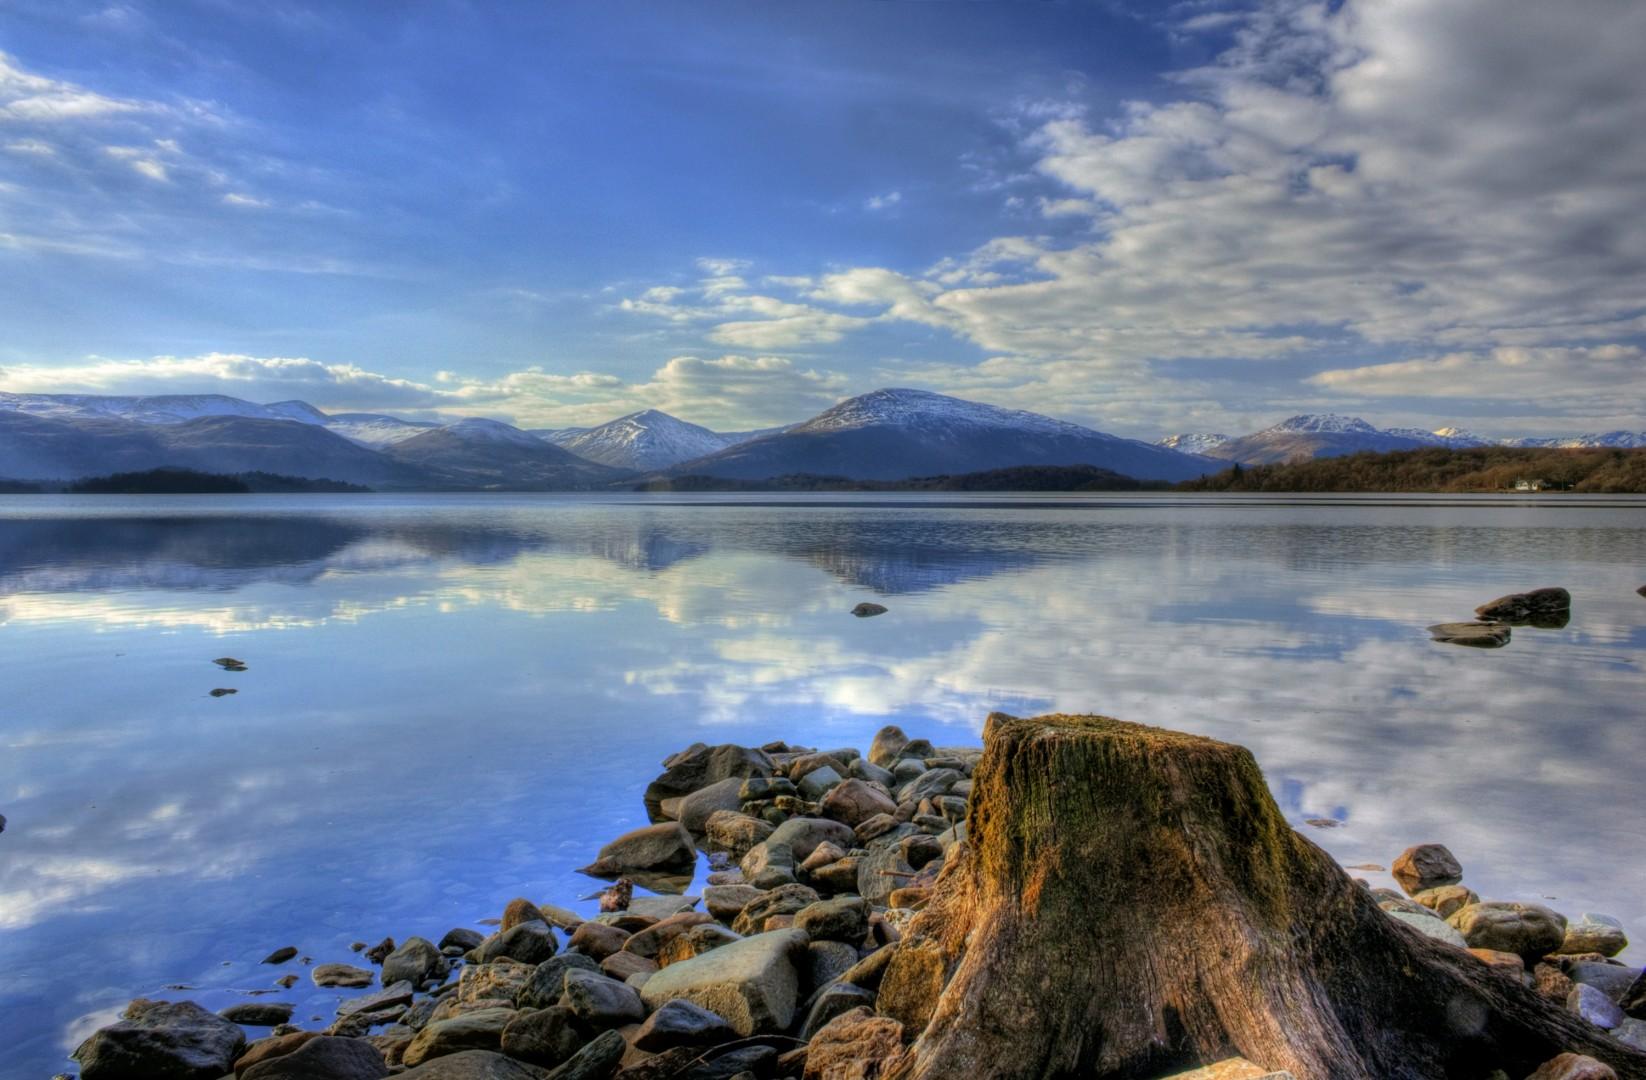 Loch Lomond National Park Kelpies Stirling Castle Visitscotland